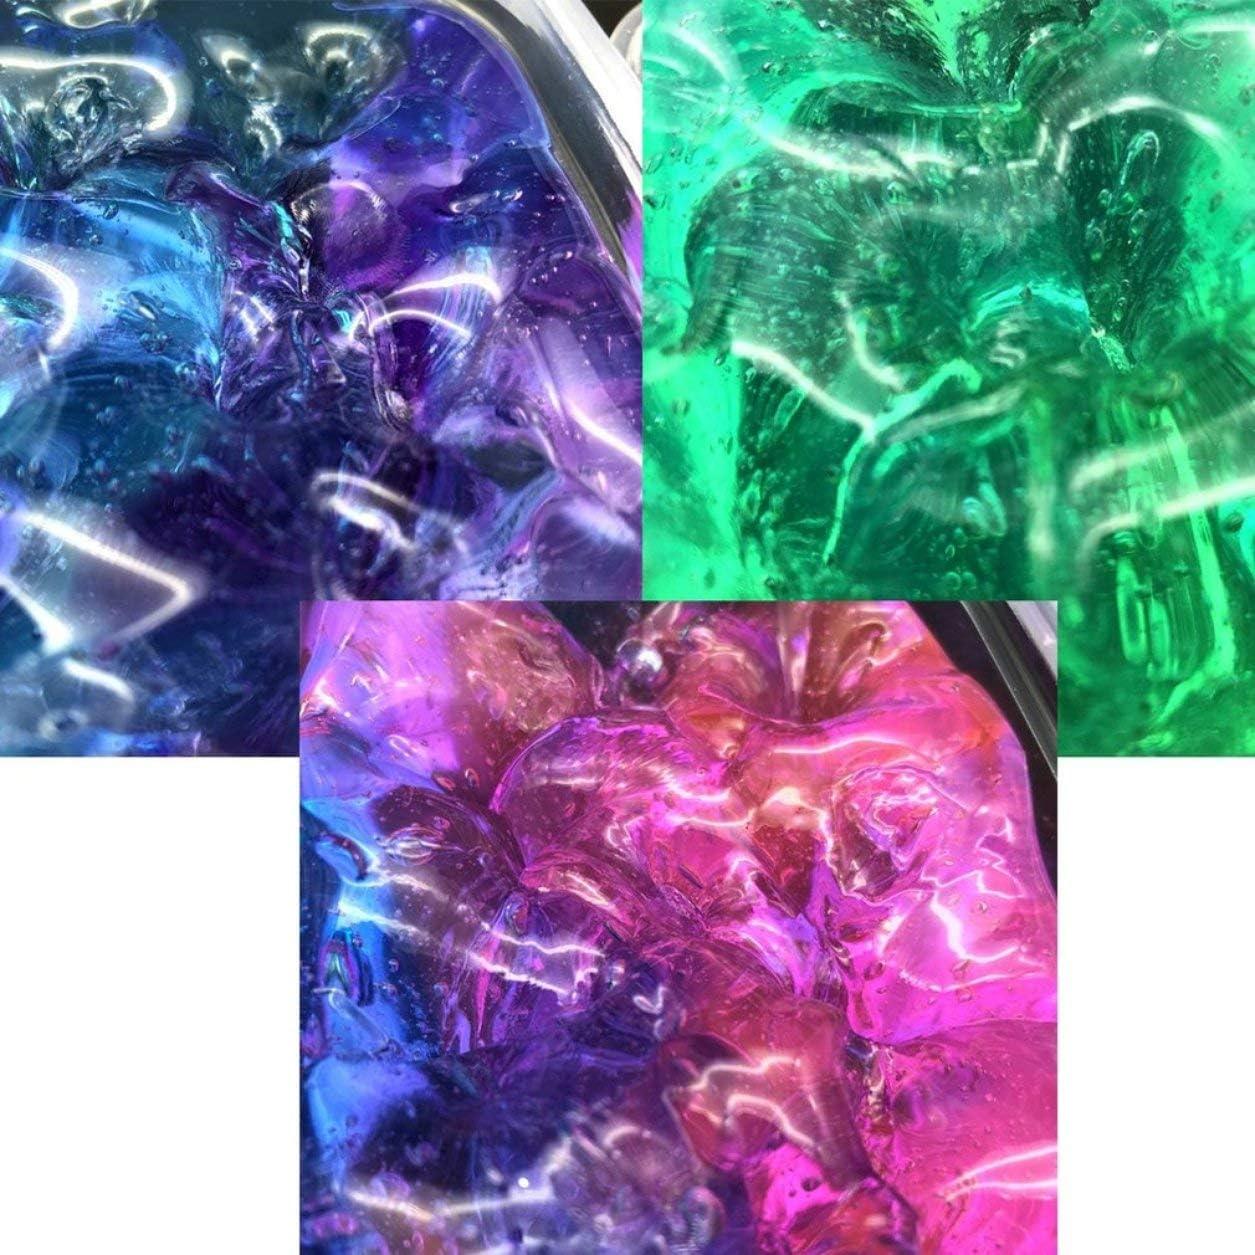 Kongqiabona-UK Magic Crystal Slime Mud 60ML Clay Slime DIY Crystal Mud Play Transparente Magic Kid Toys Ni/ños Creatividad Imaginaci/ón Juguetes educativos